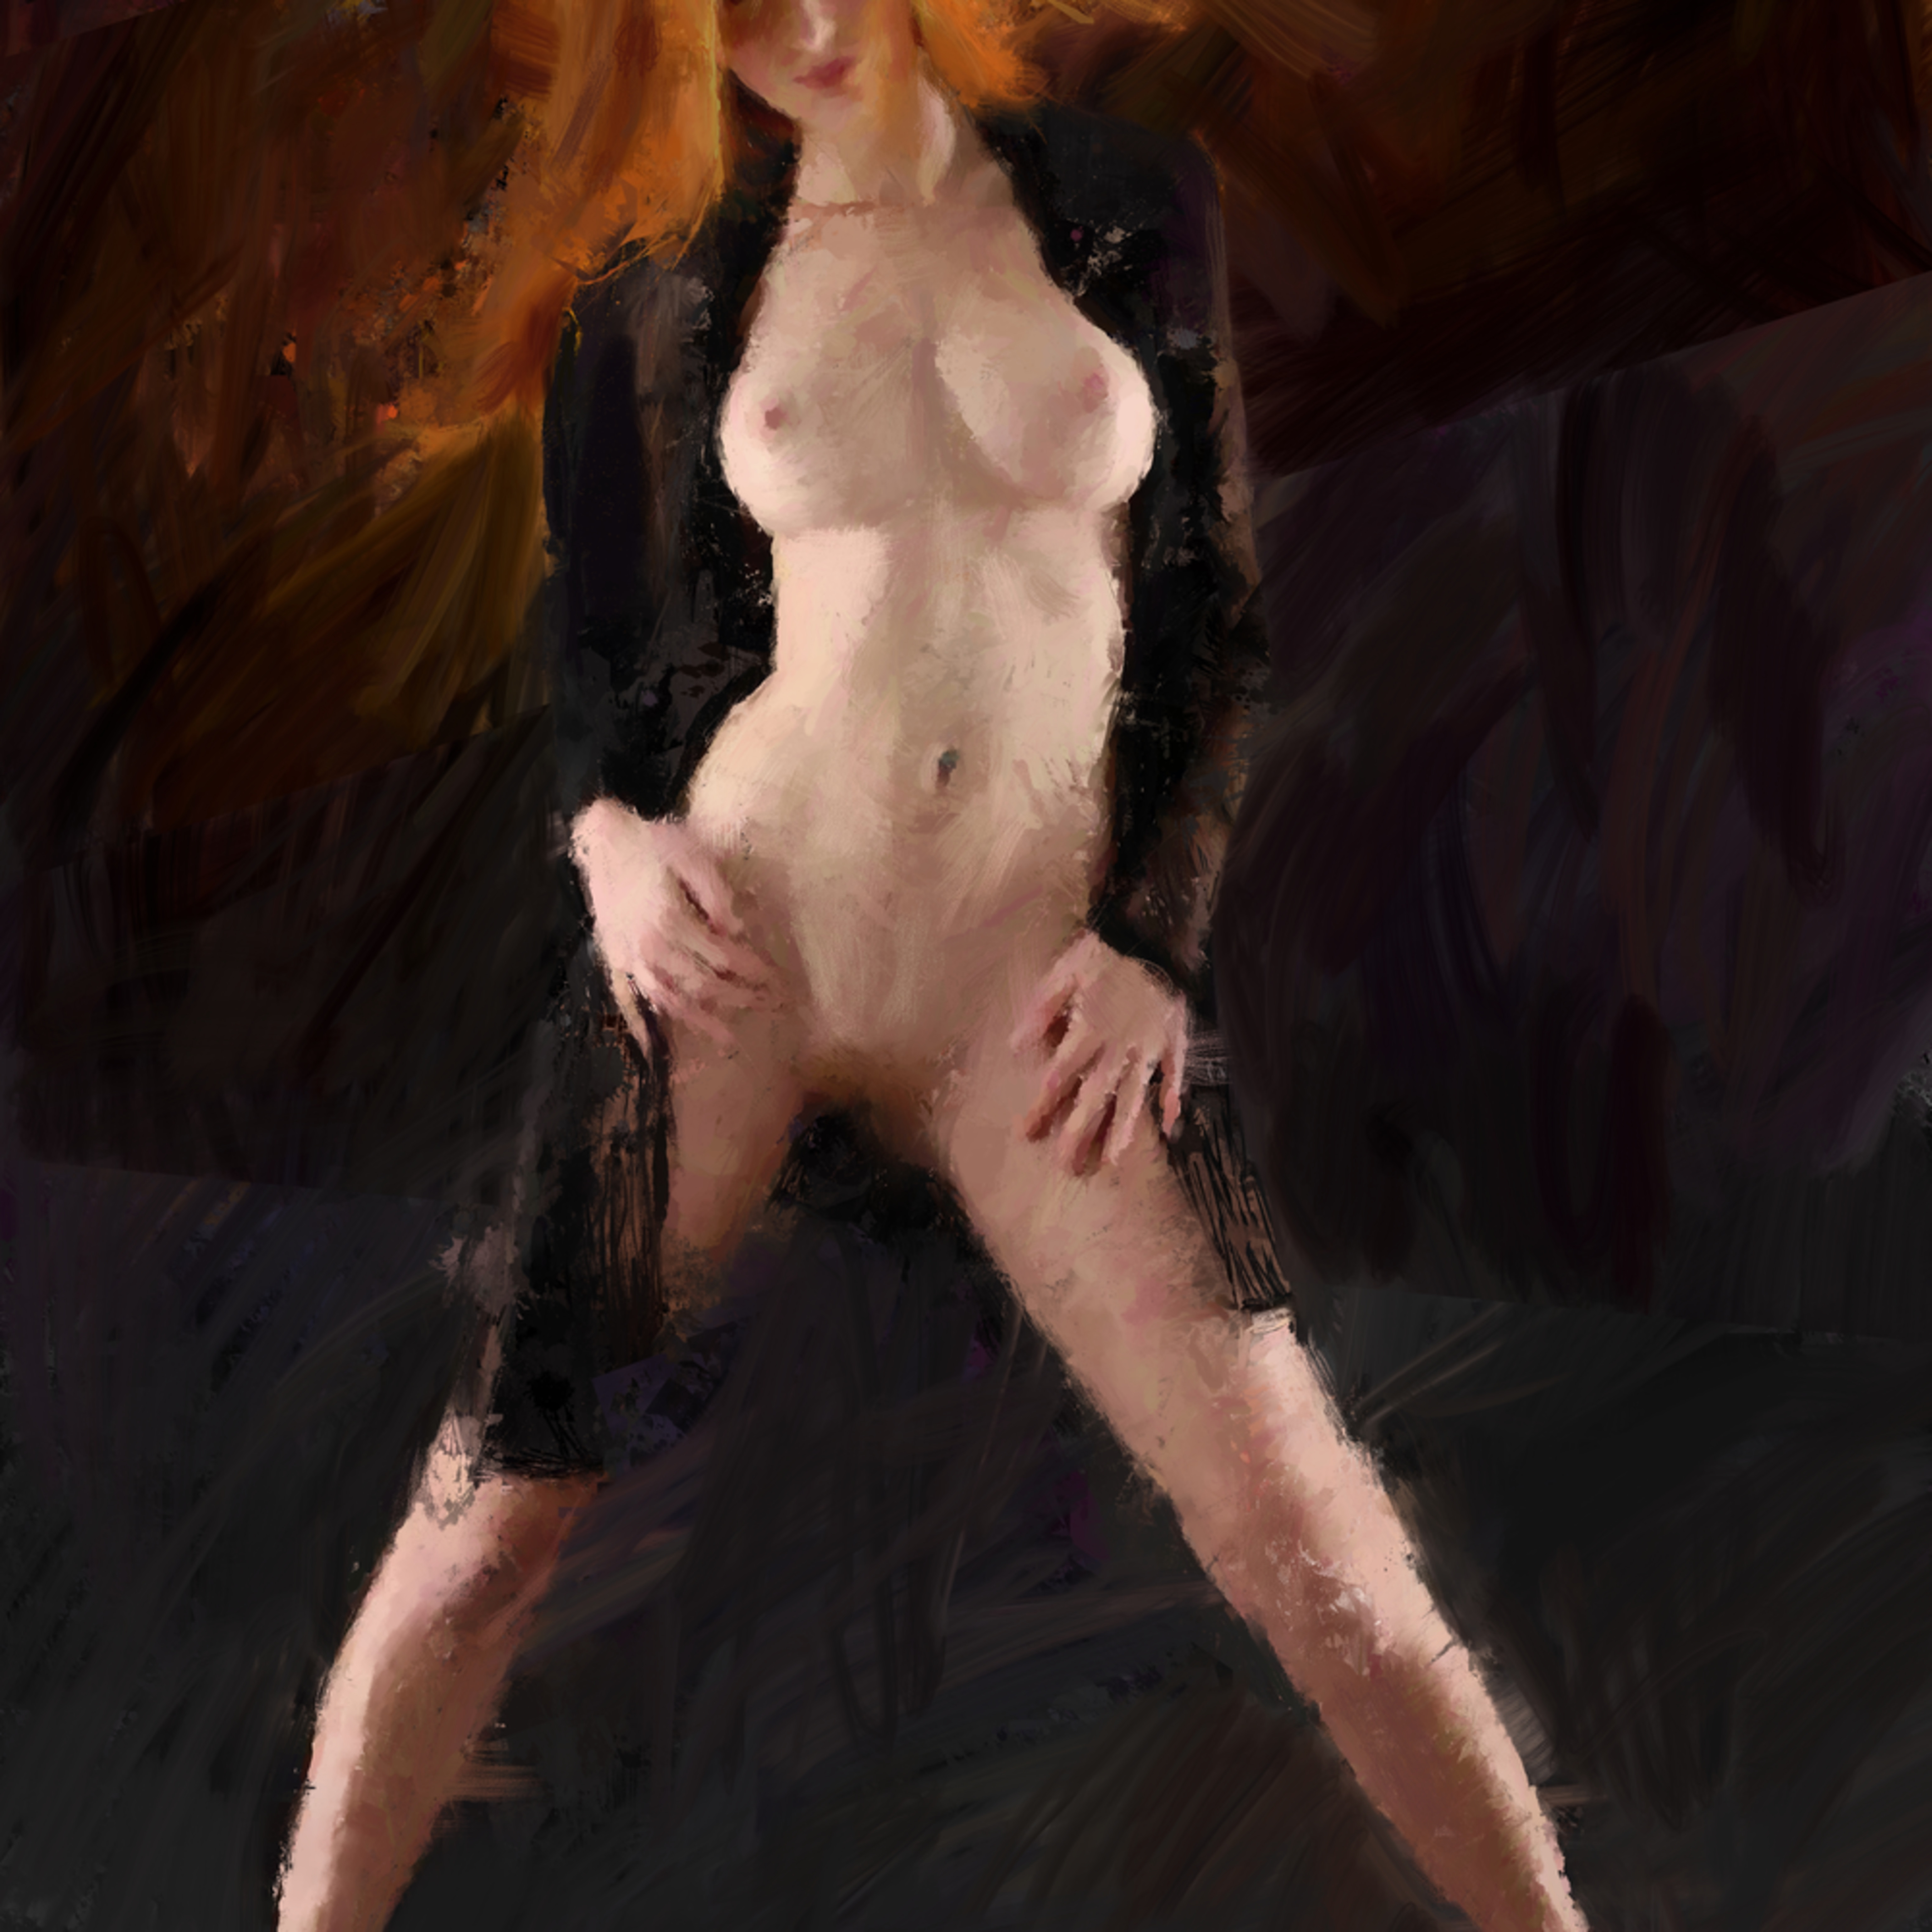 Ginger in black digital hdgqzl